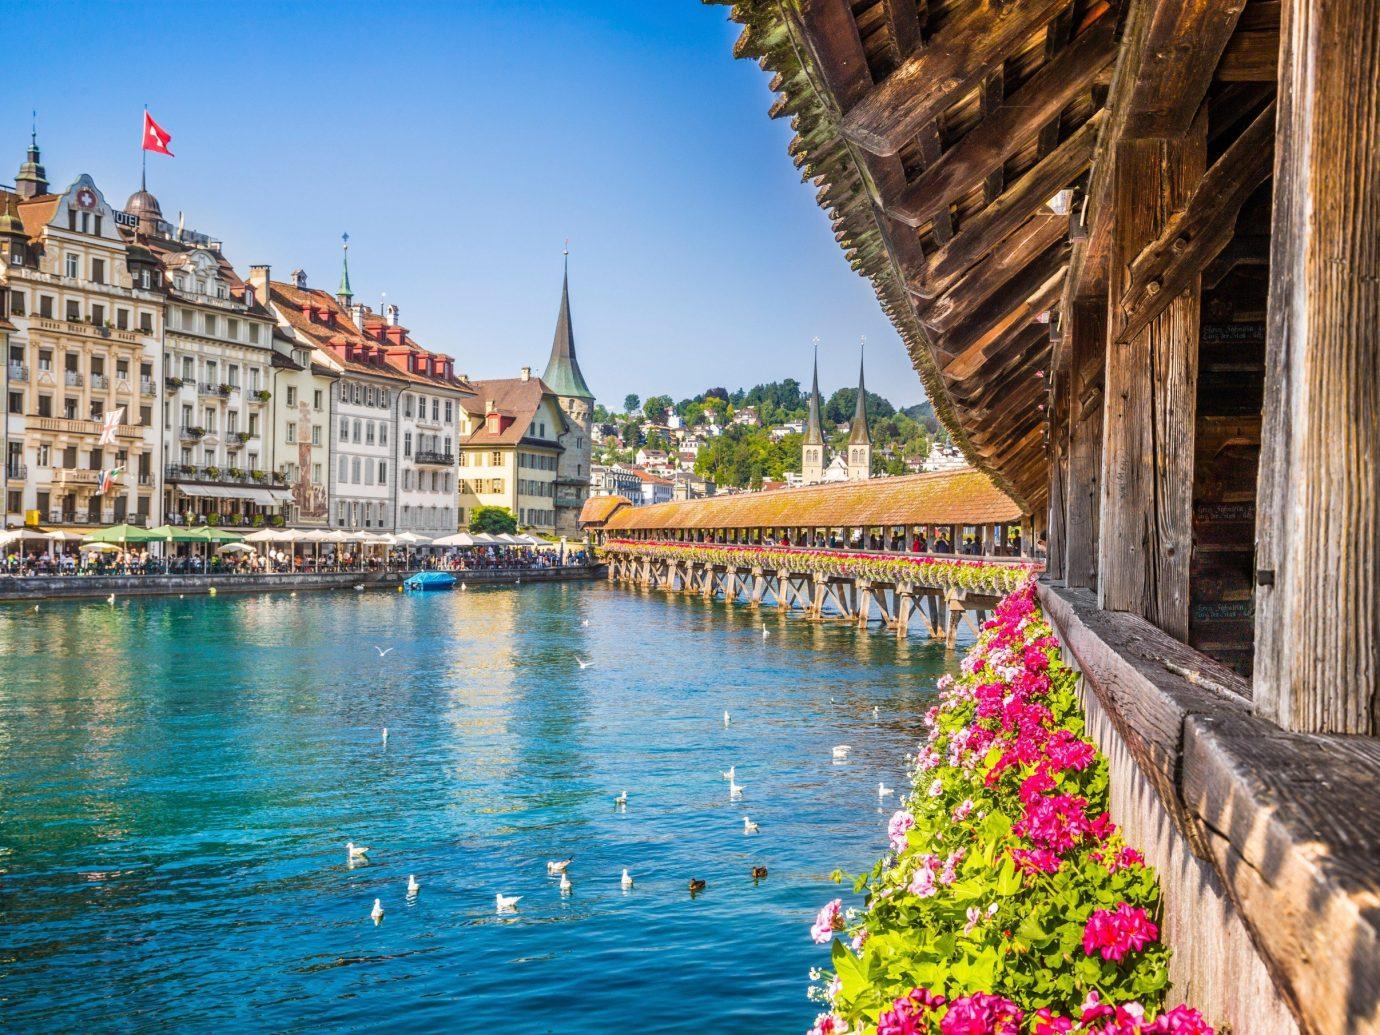 Trip Ideas outdoor water scene landmark Town tourism River vacation waterway reflection cityscape flower Sea travel